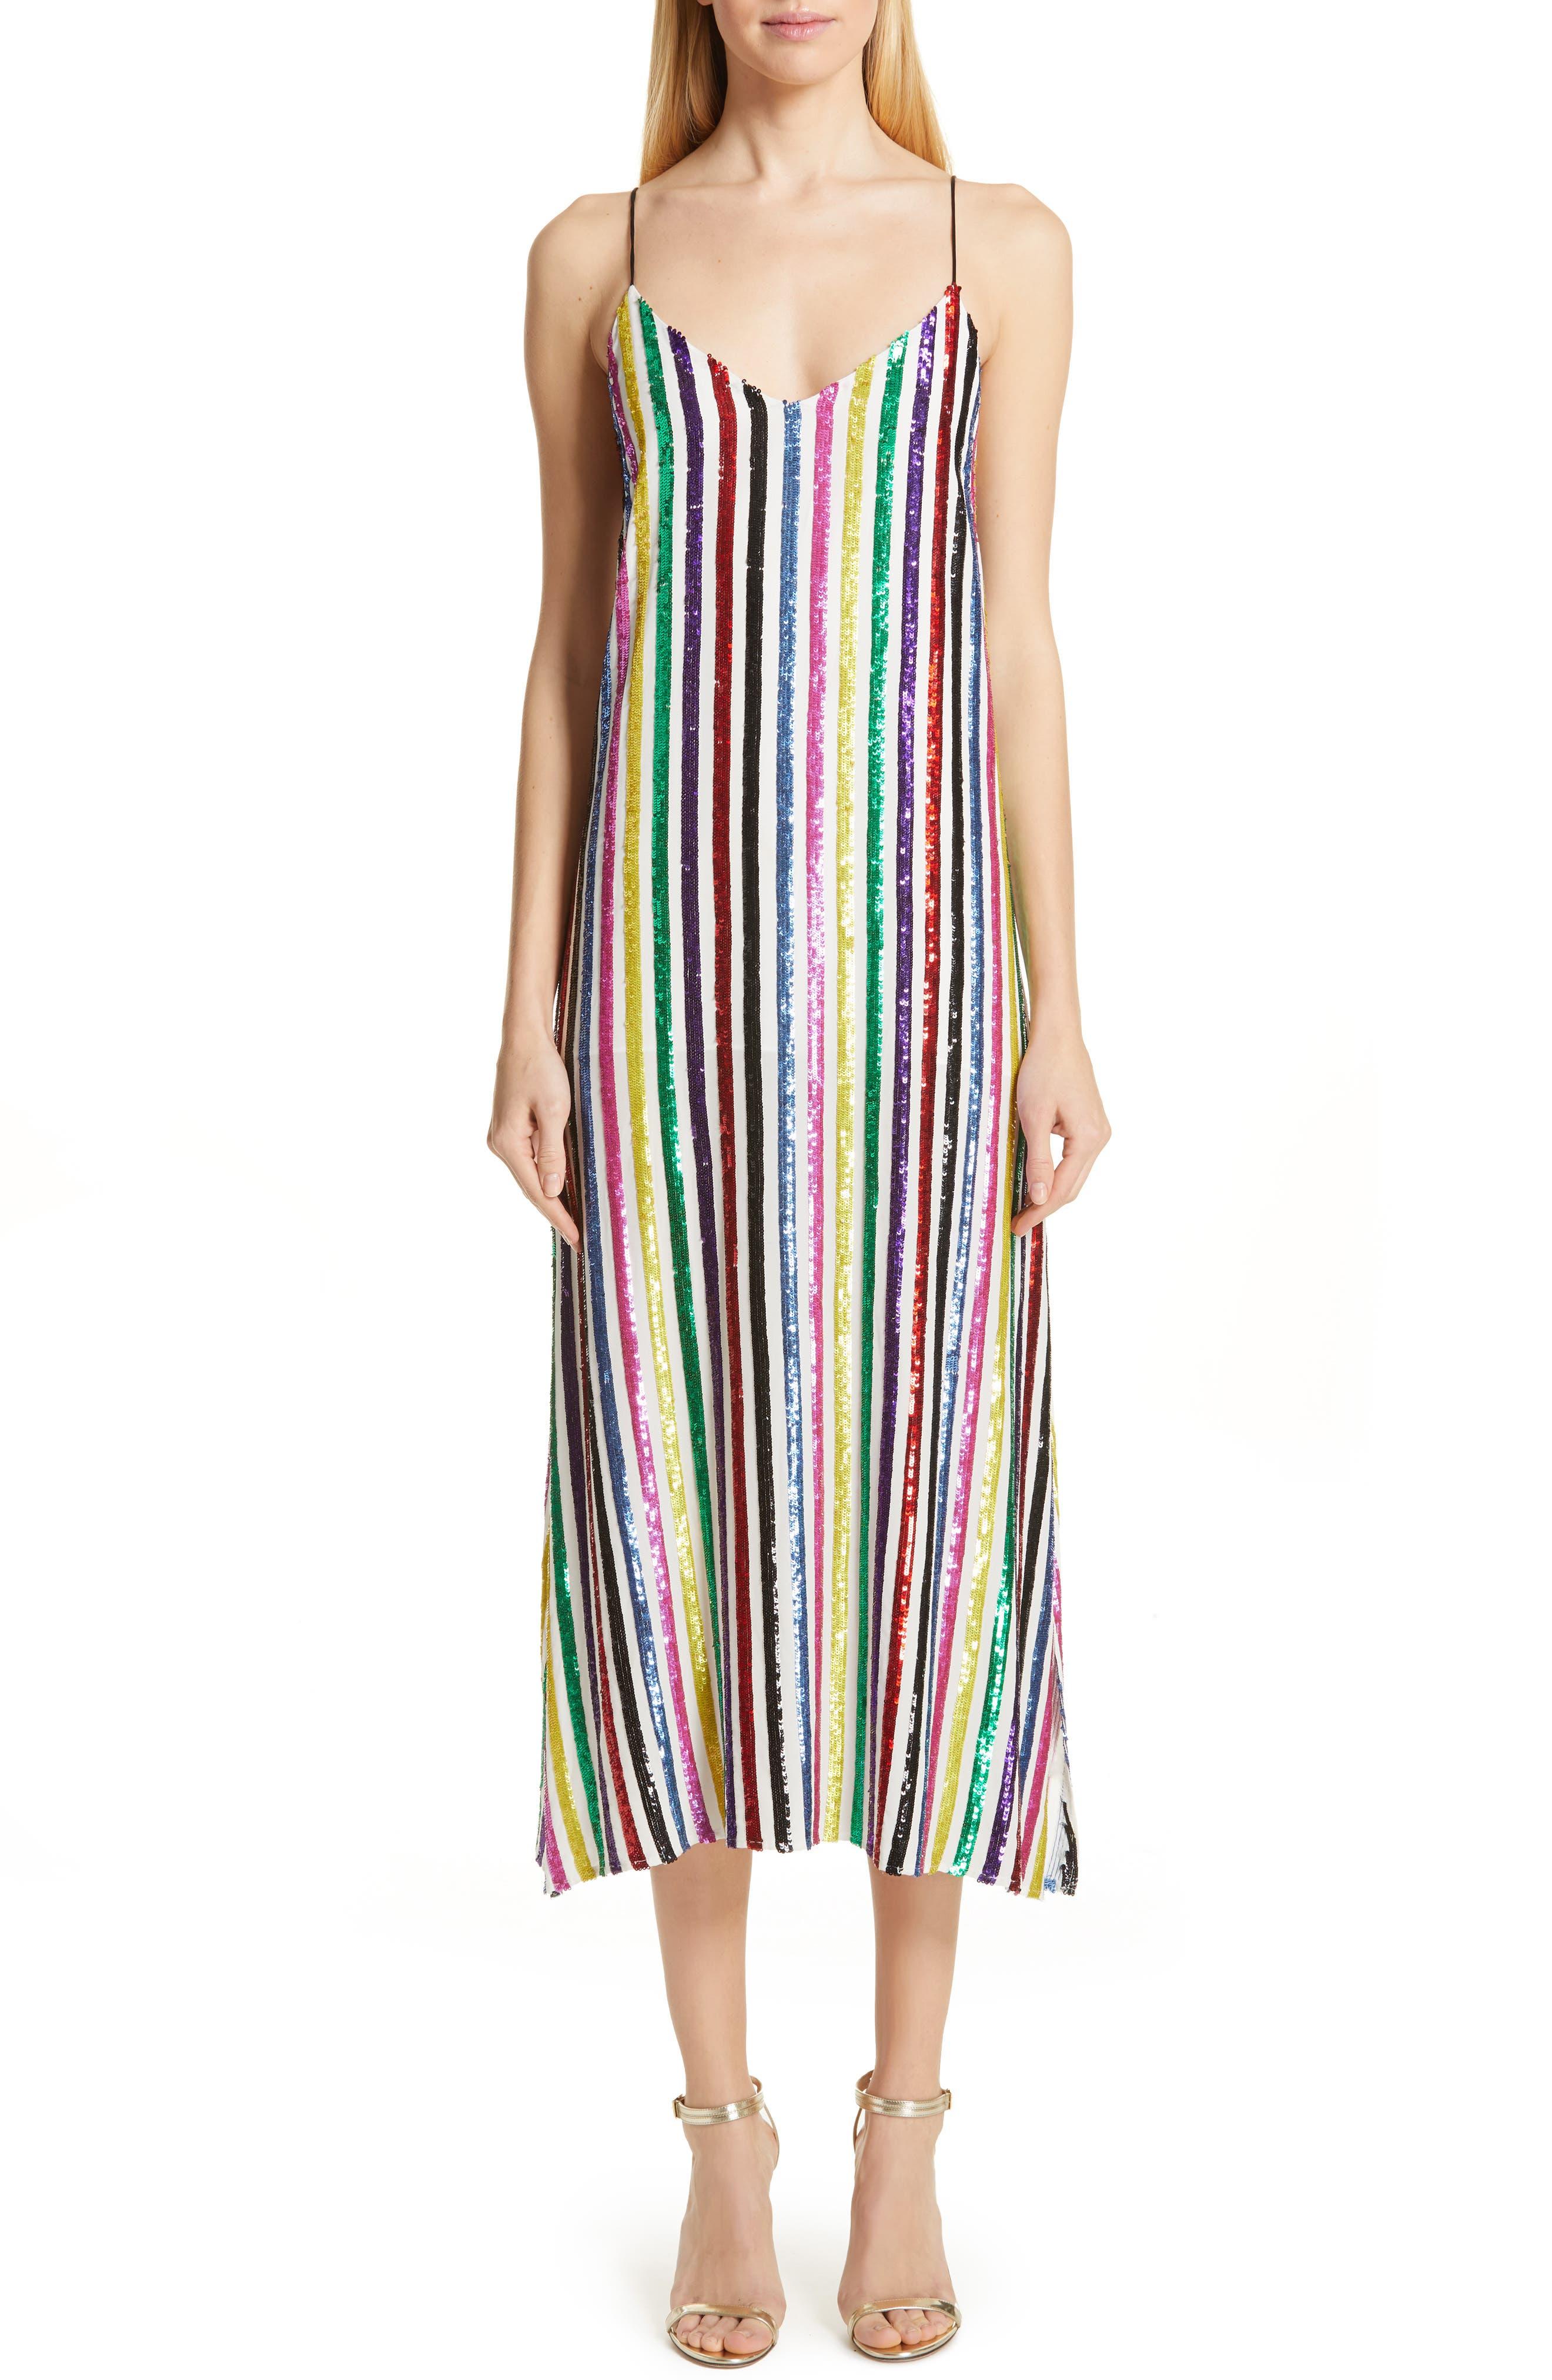 CAROLINE CONSTAS Sequin Stripe Midi Slipdress, Main, color, WHITE MULTI